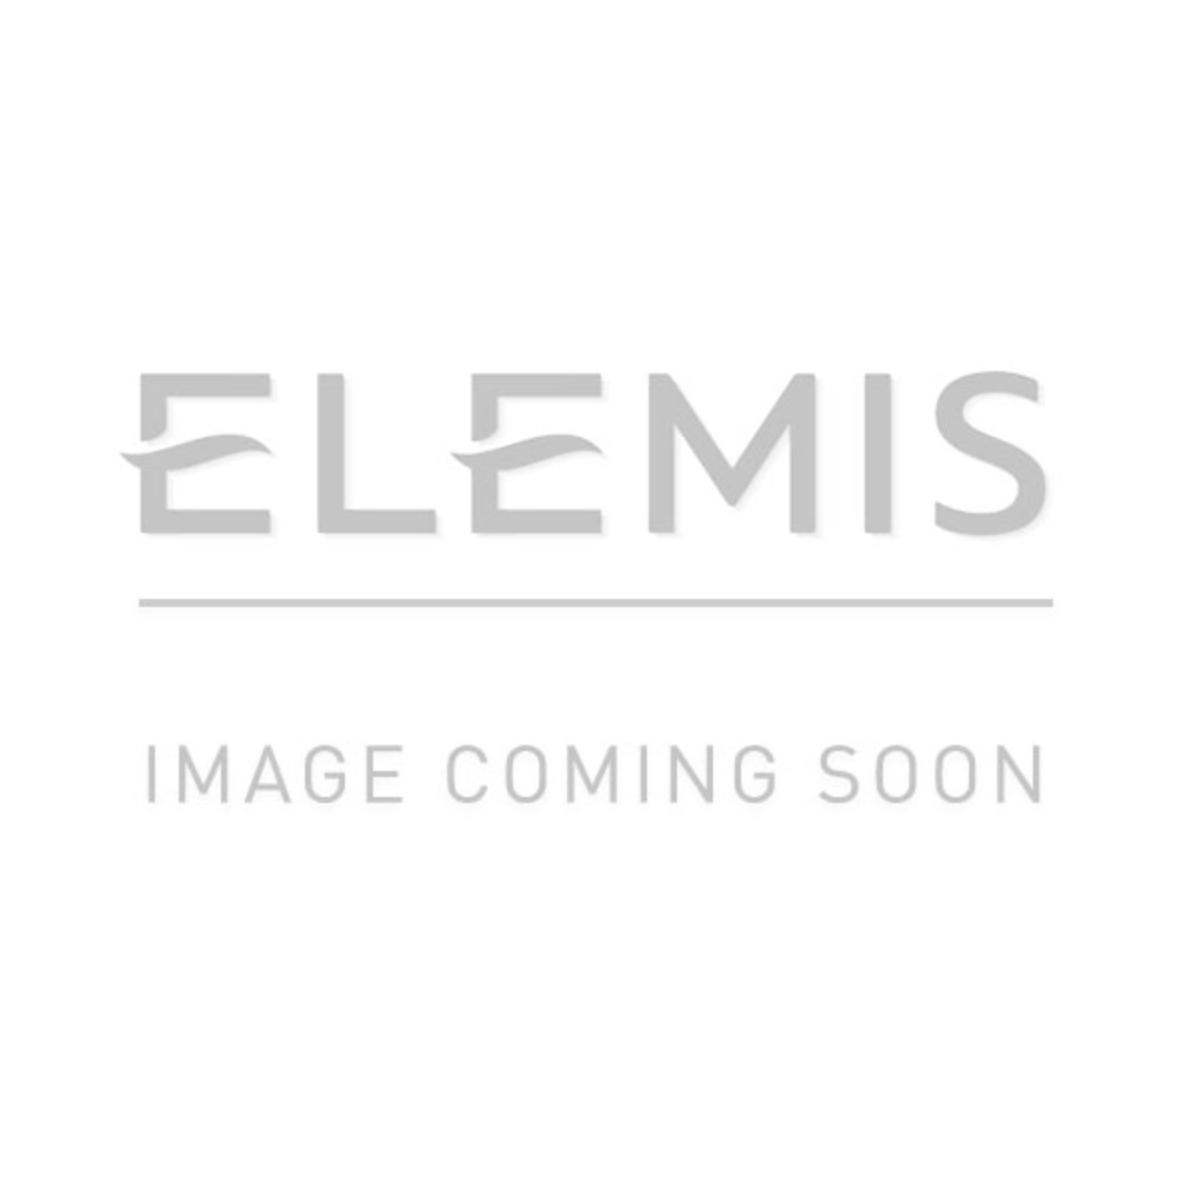 Elemis instant refreshing gel 150ml body gel elemis - Elemis shower gel ...